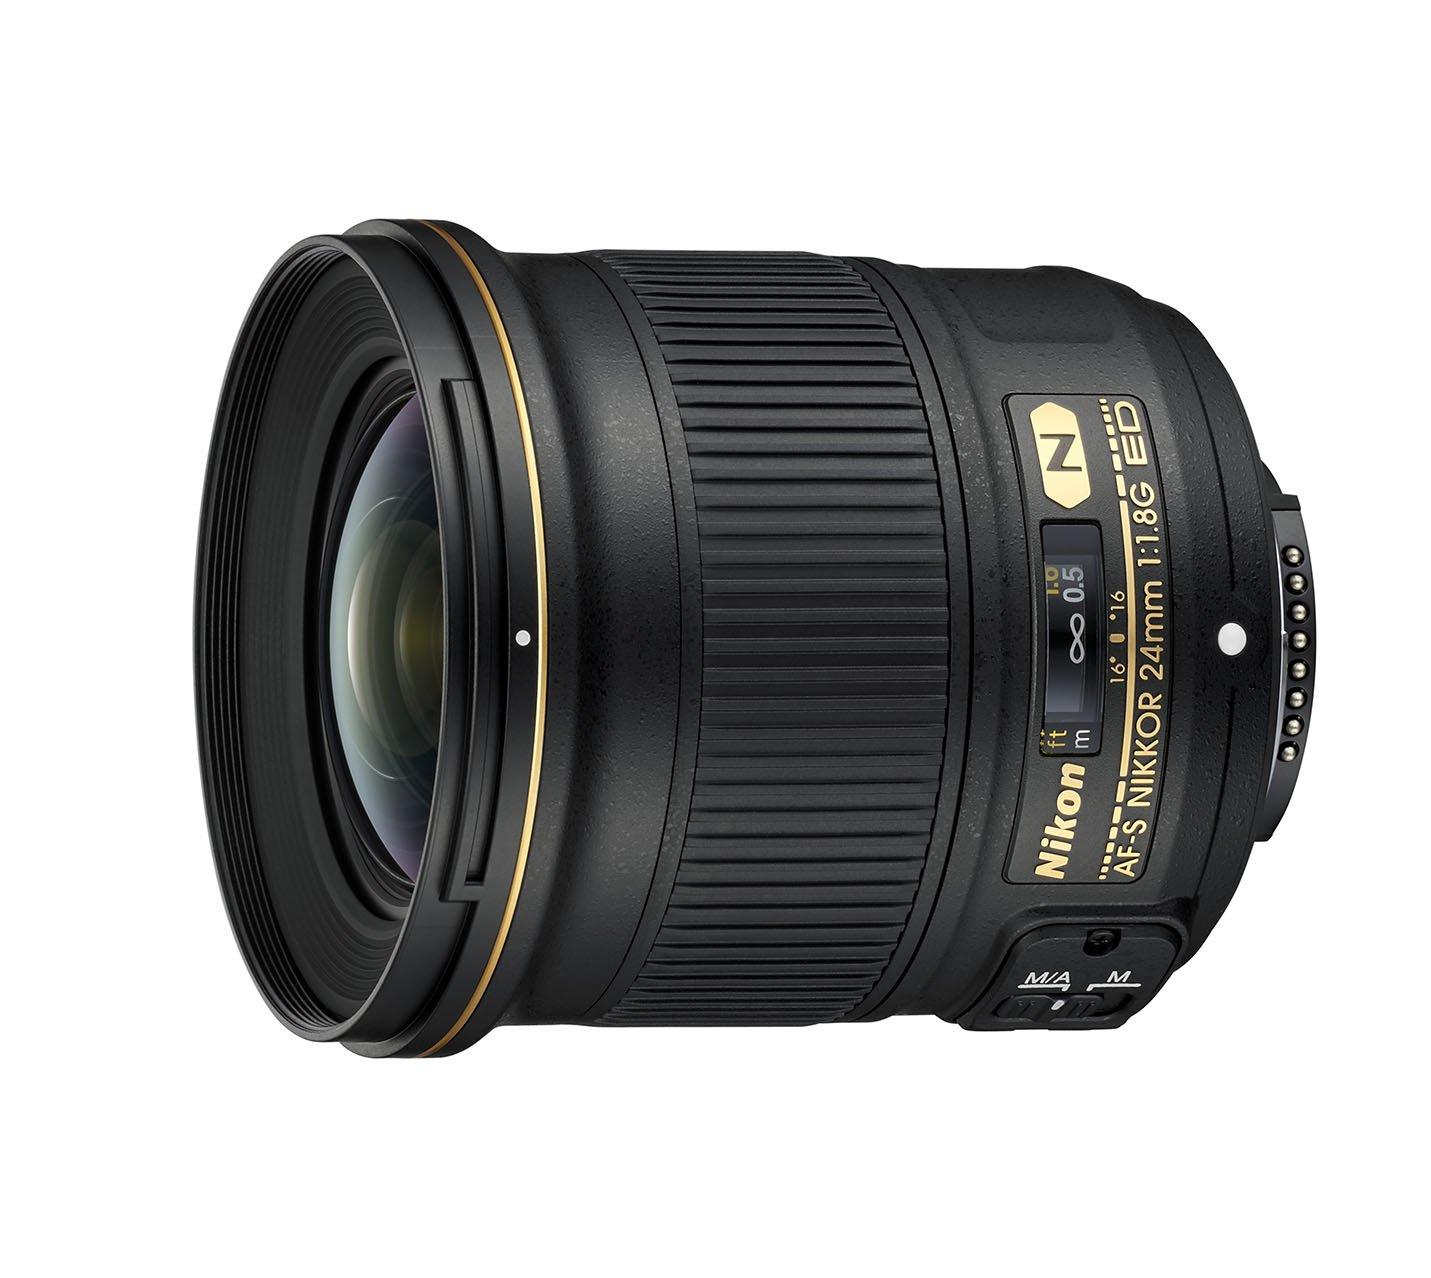 Nikon Obiettivo Nikkor AF-S 24 mm F/1.8G ED, Nero [Nital Card: 4 Anni di Garanzia]